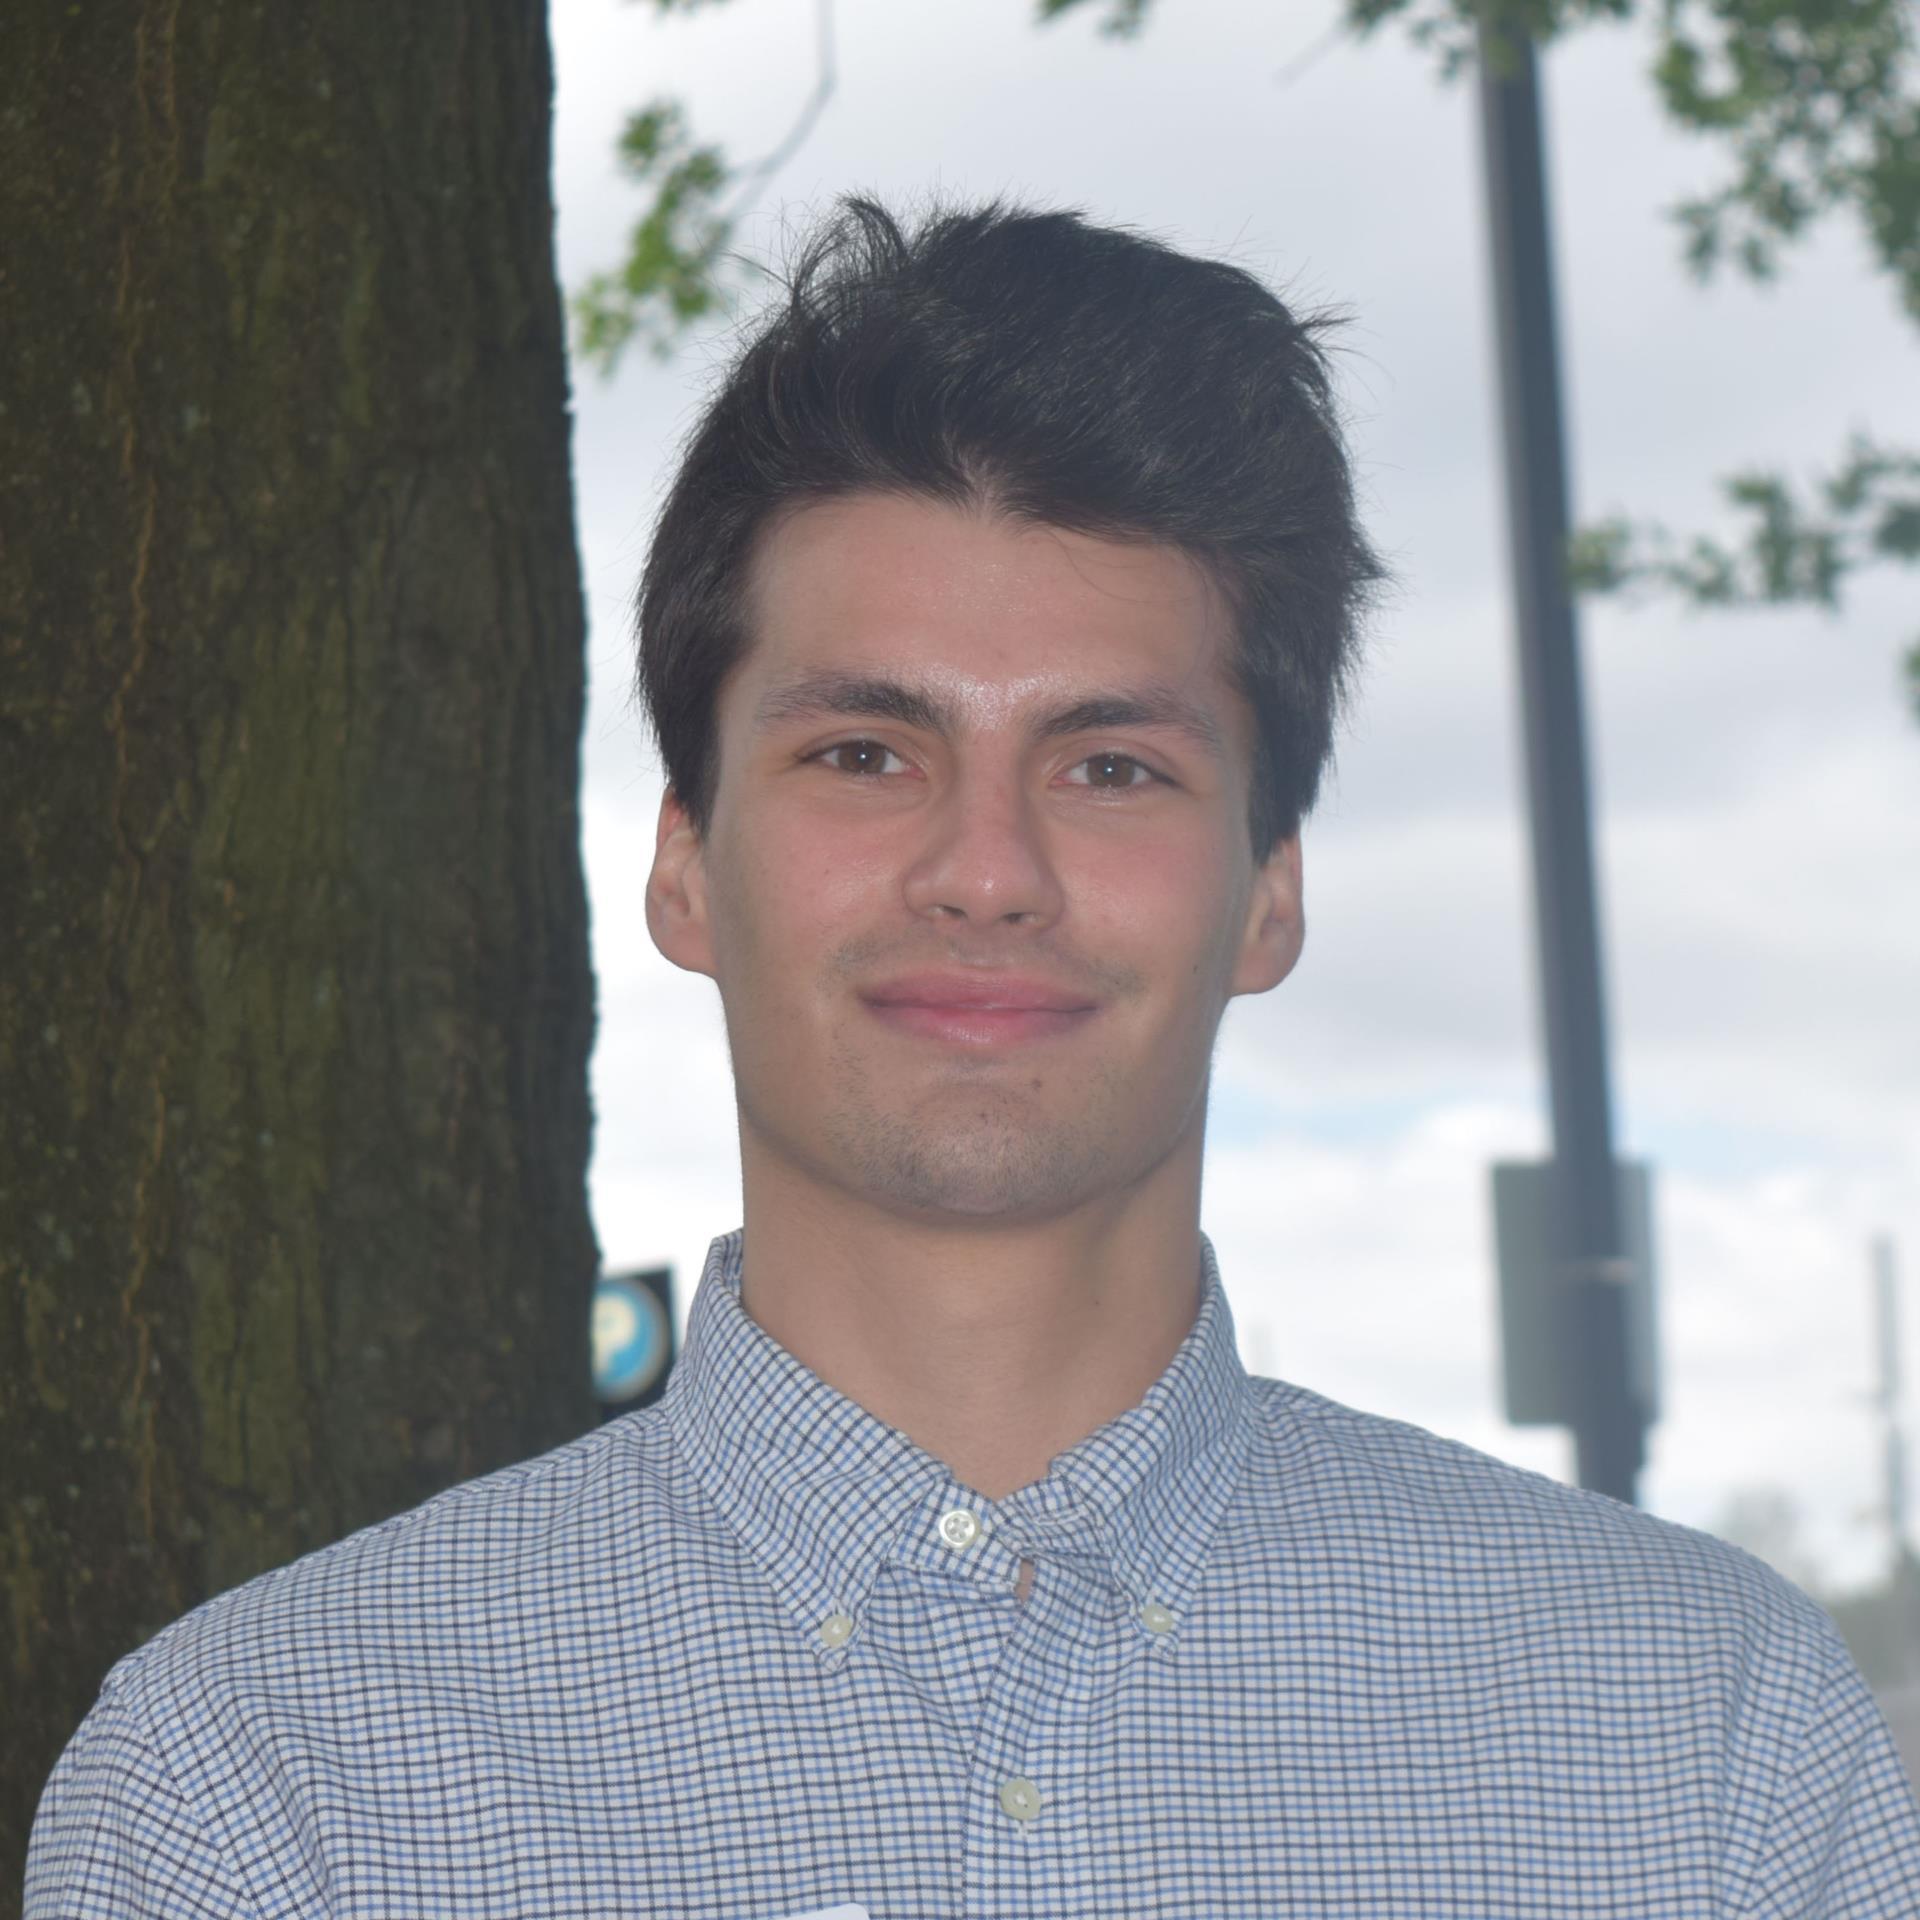 MPH practicum student Joseph Hnath